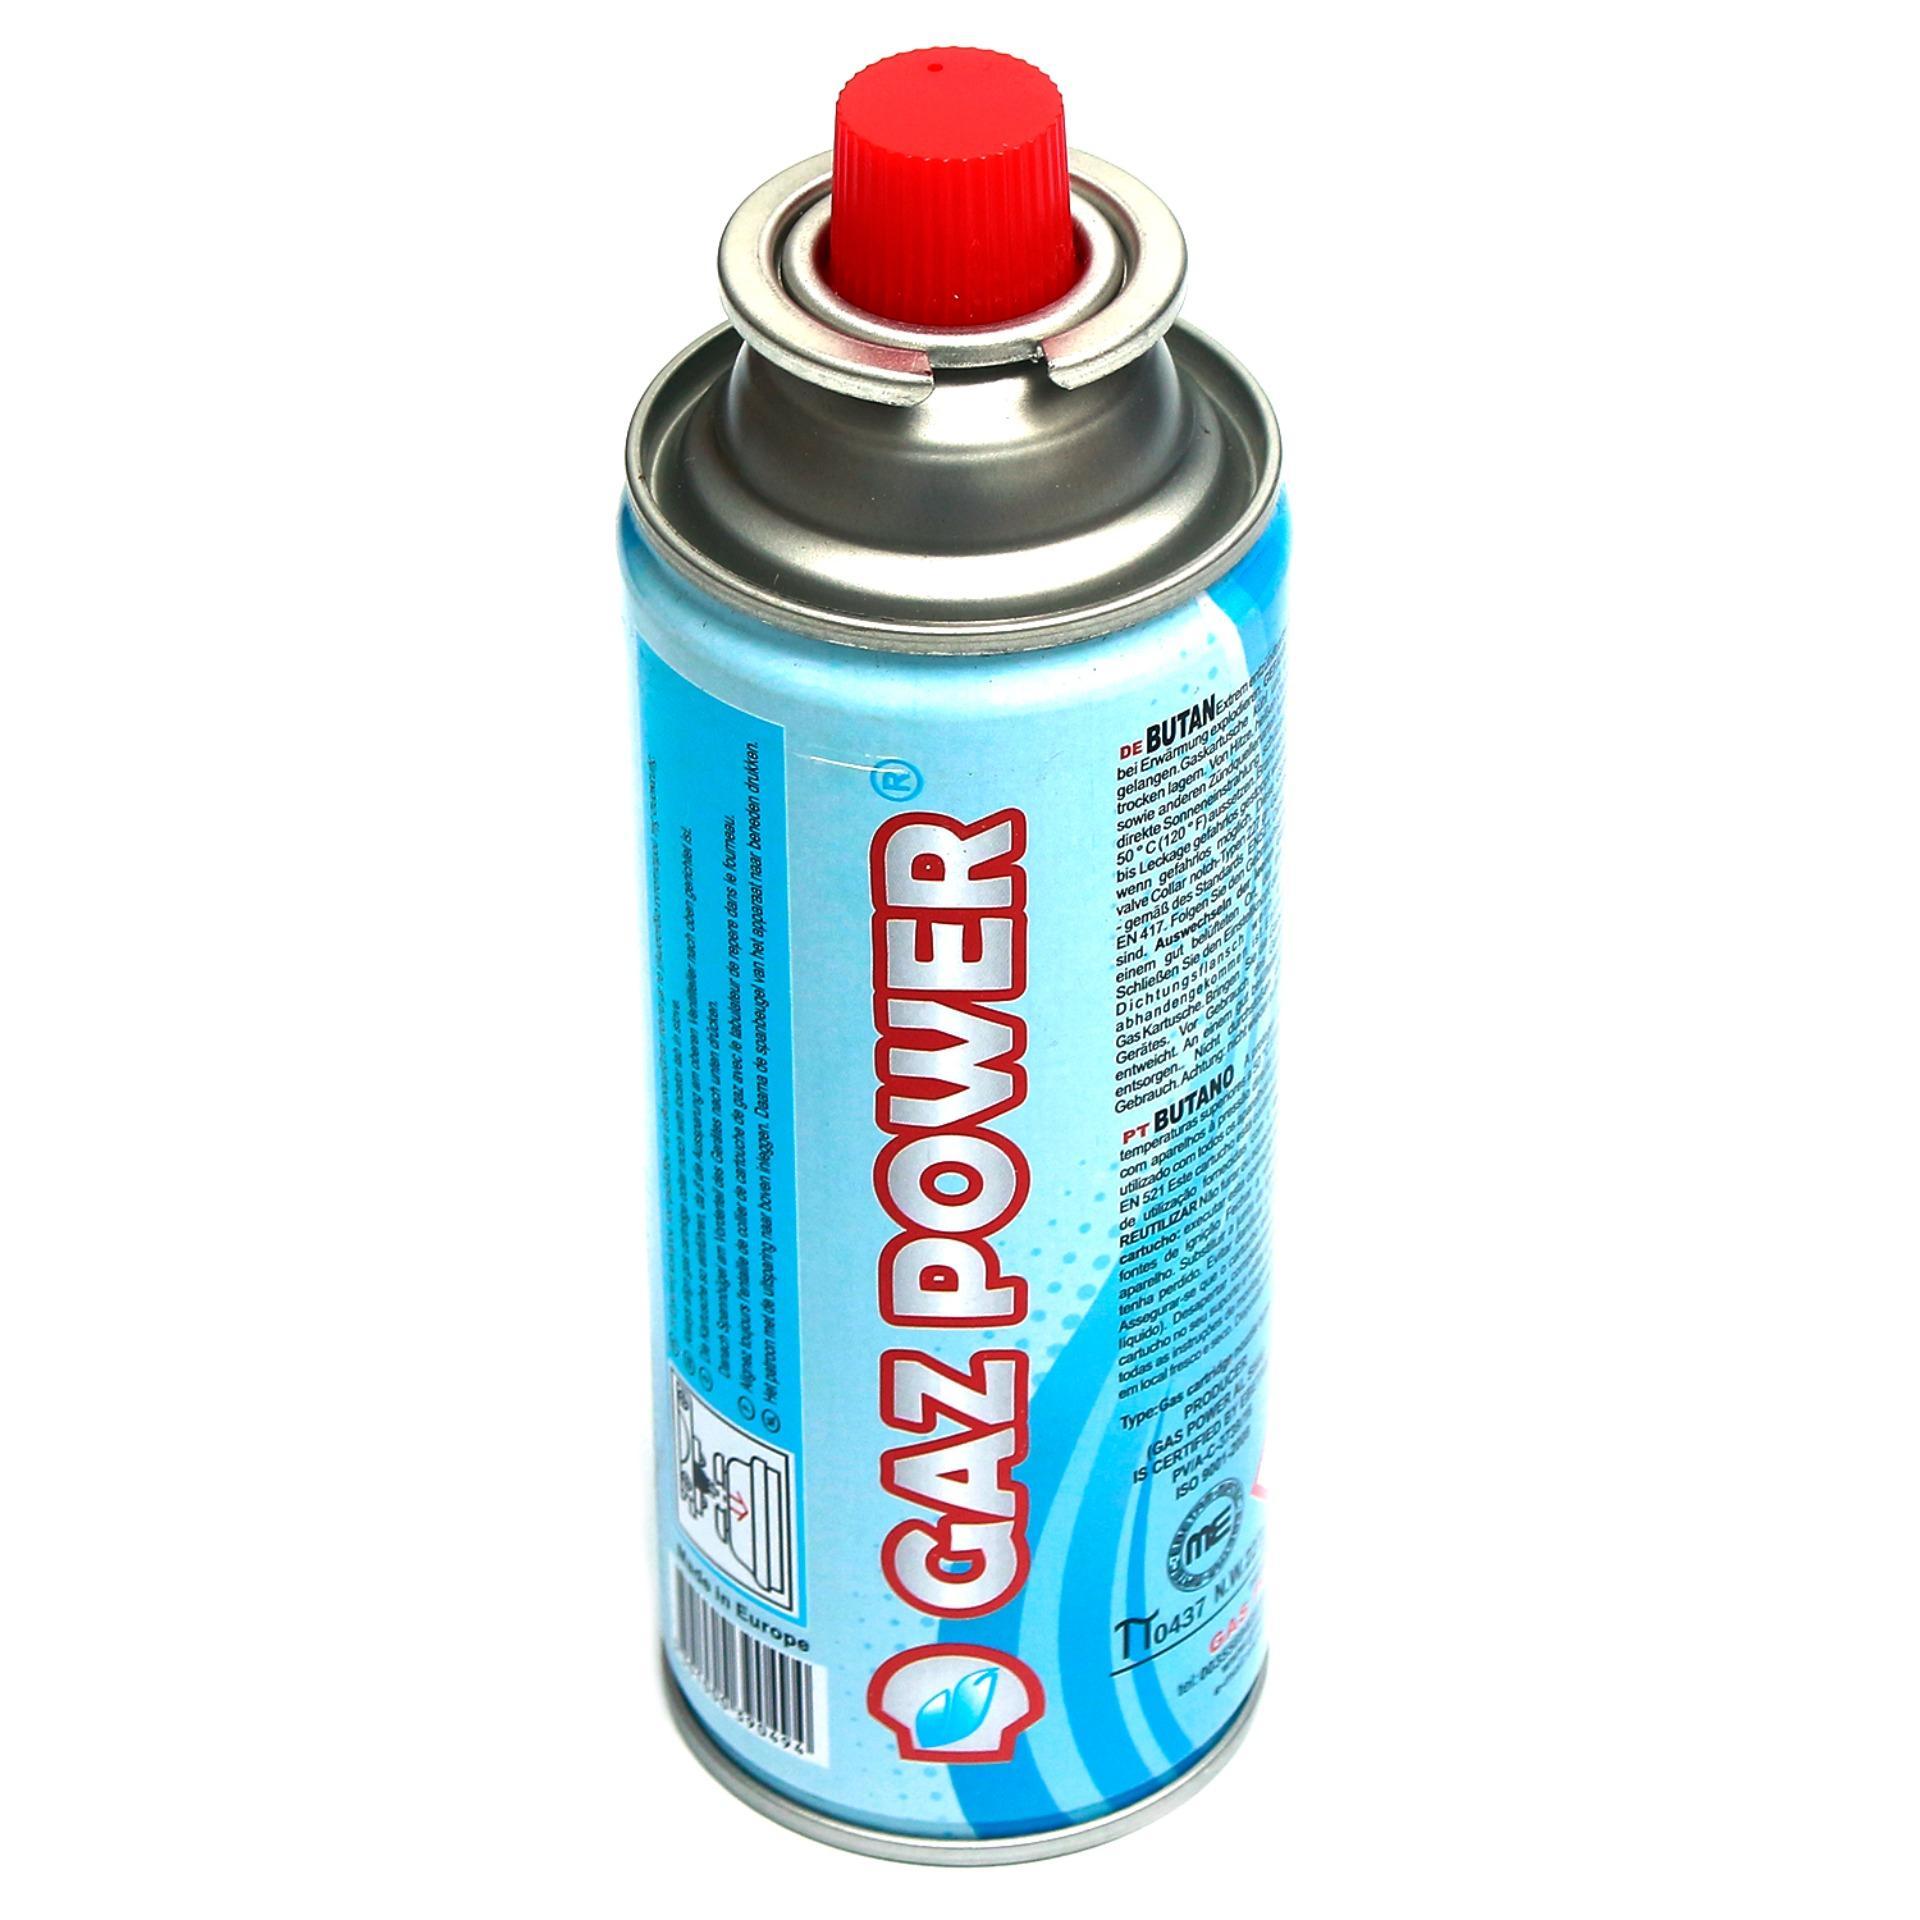 220 Gr Butane Gas Cartridge - Multi